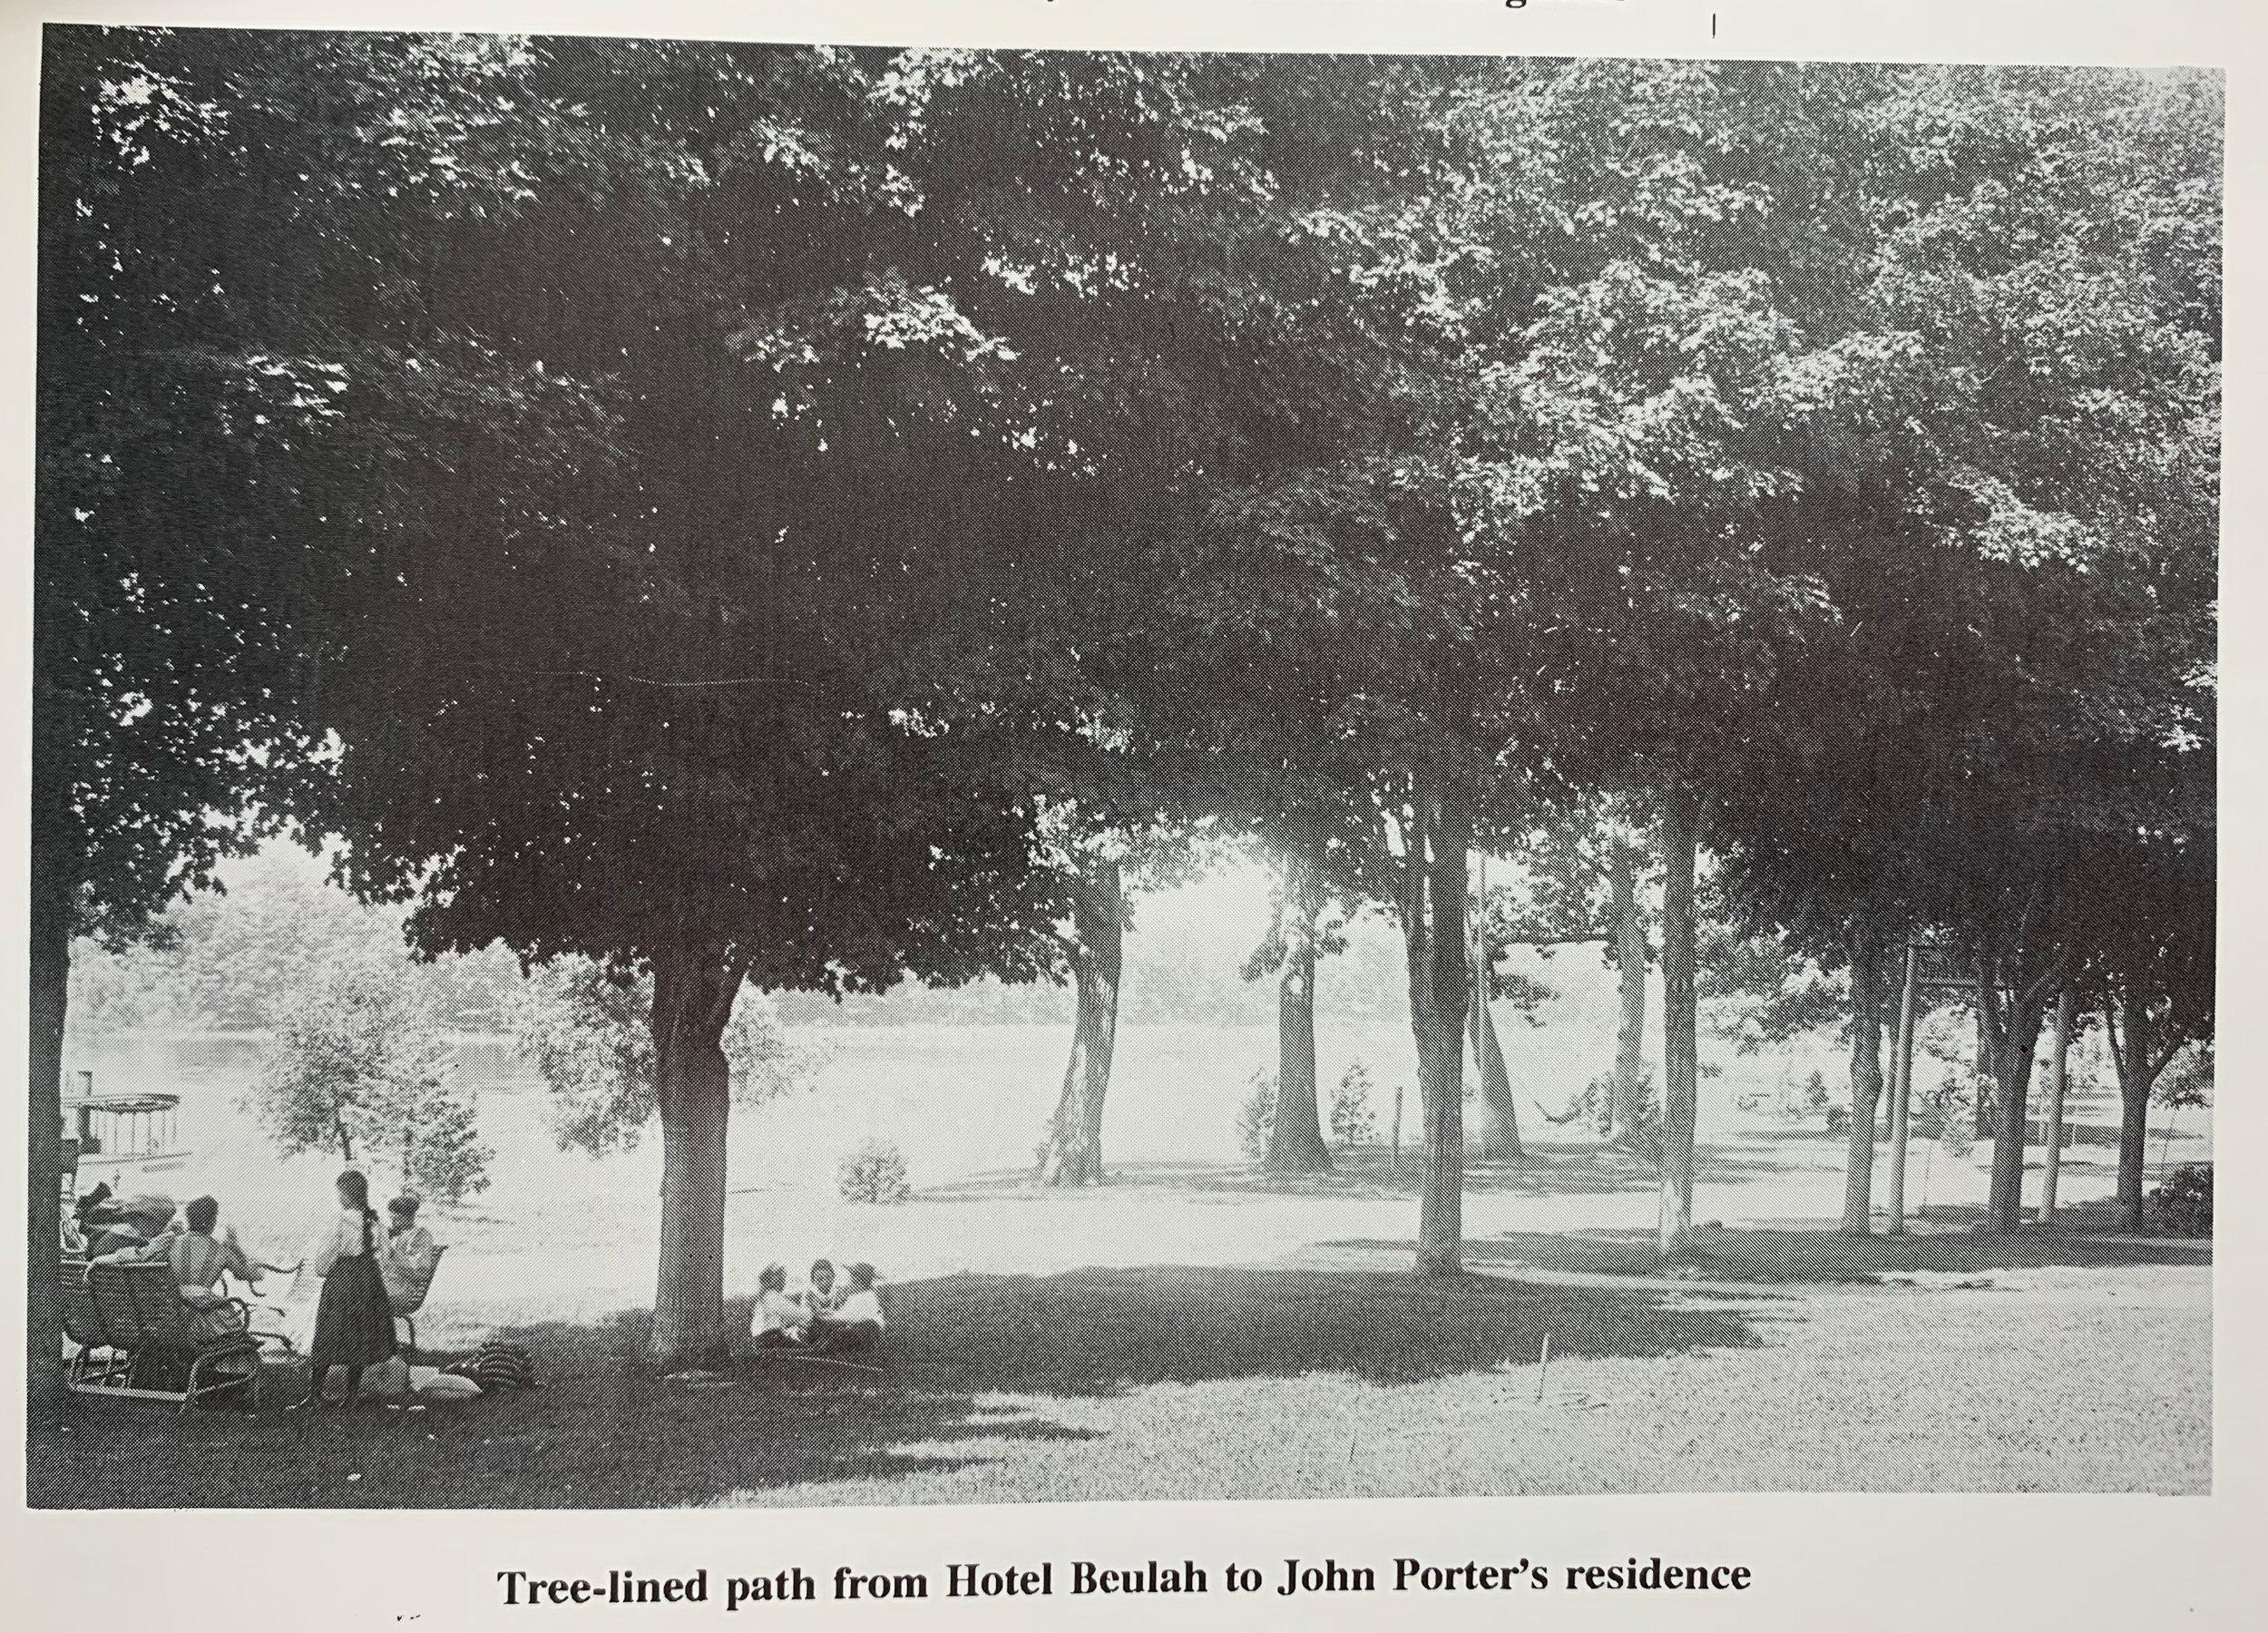 Lake_Beulah_History_LBYC-003.jpg